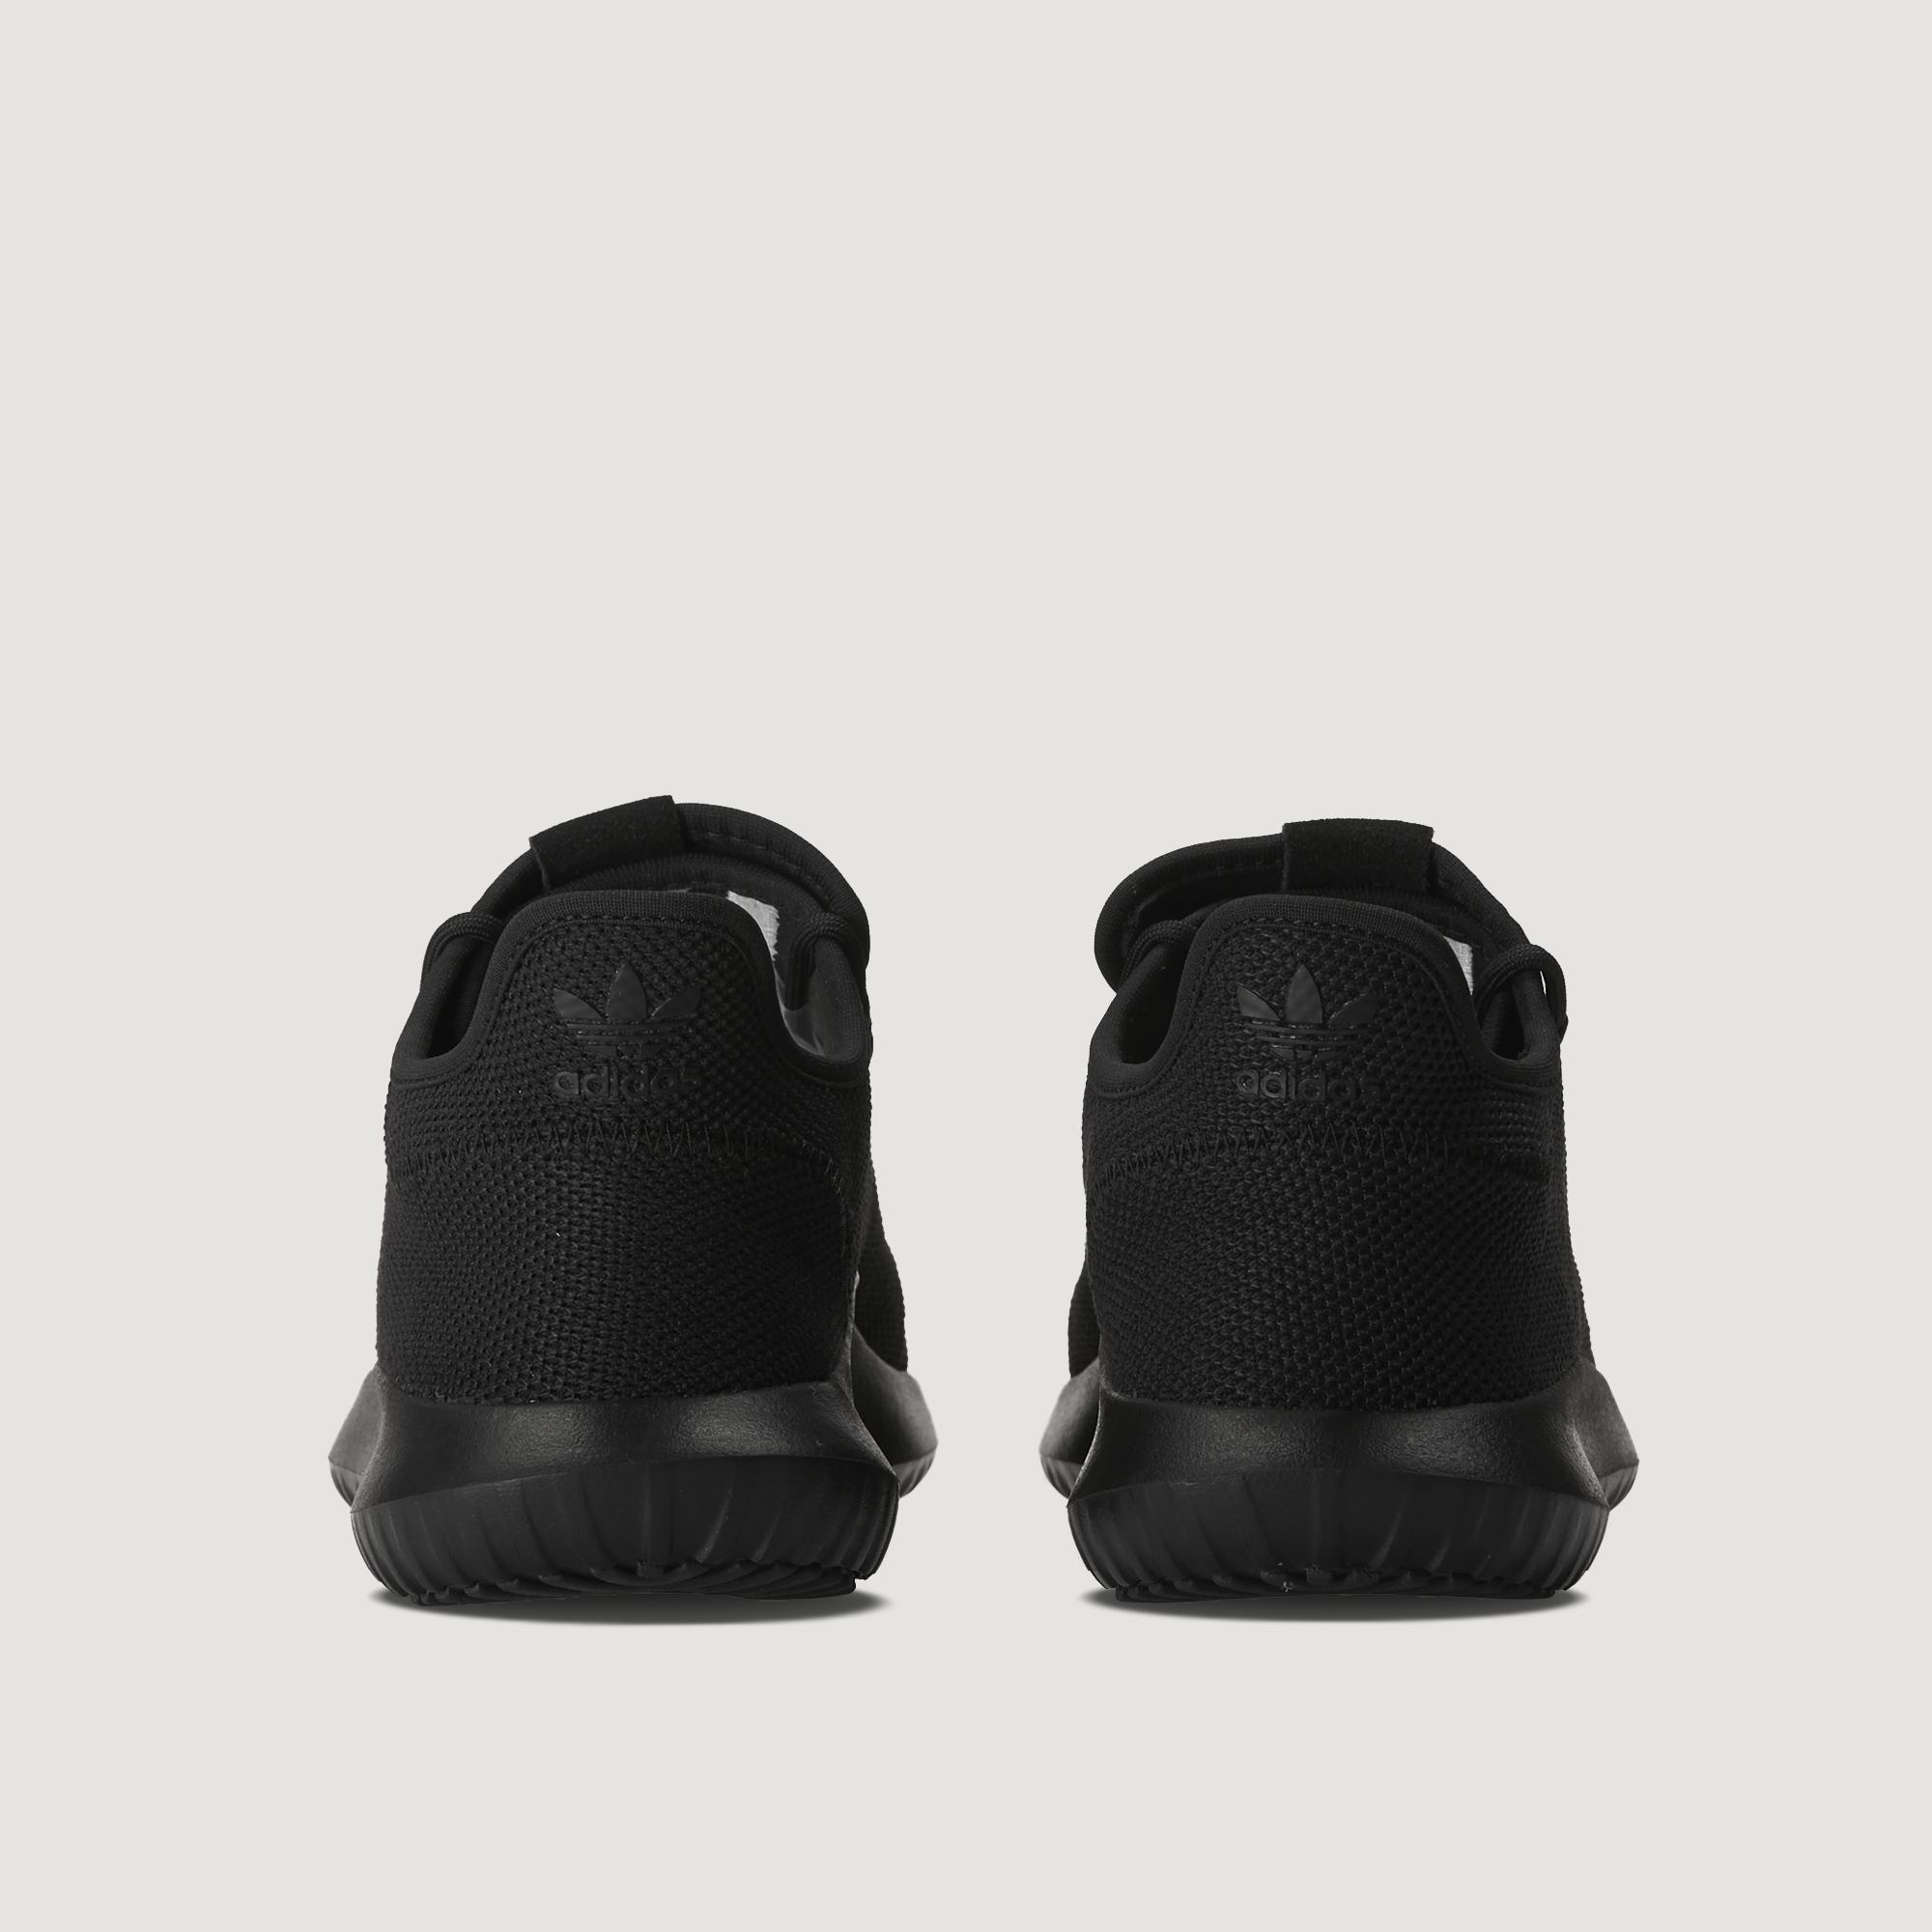 TUBULAR SHADOW Pig Shoes